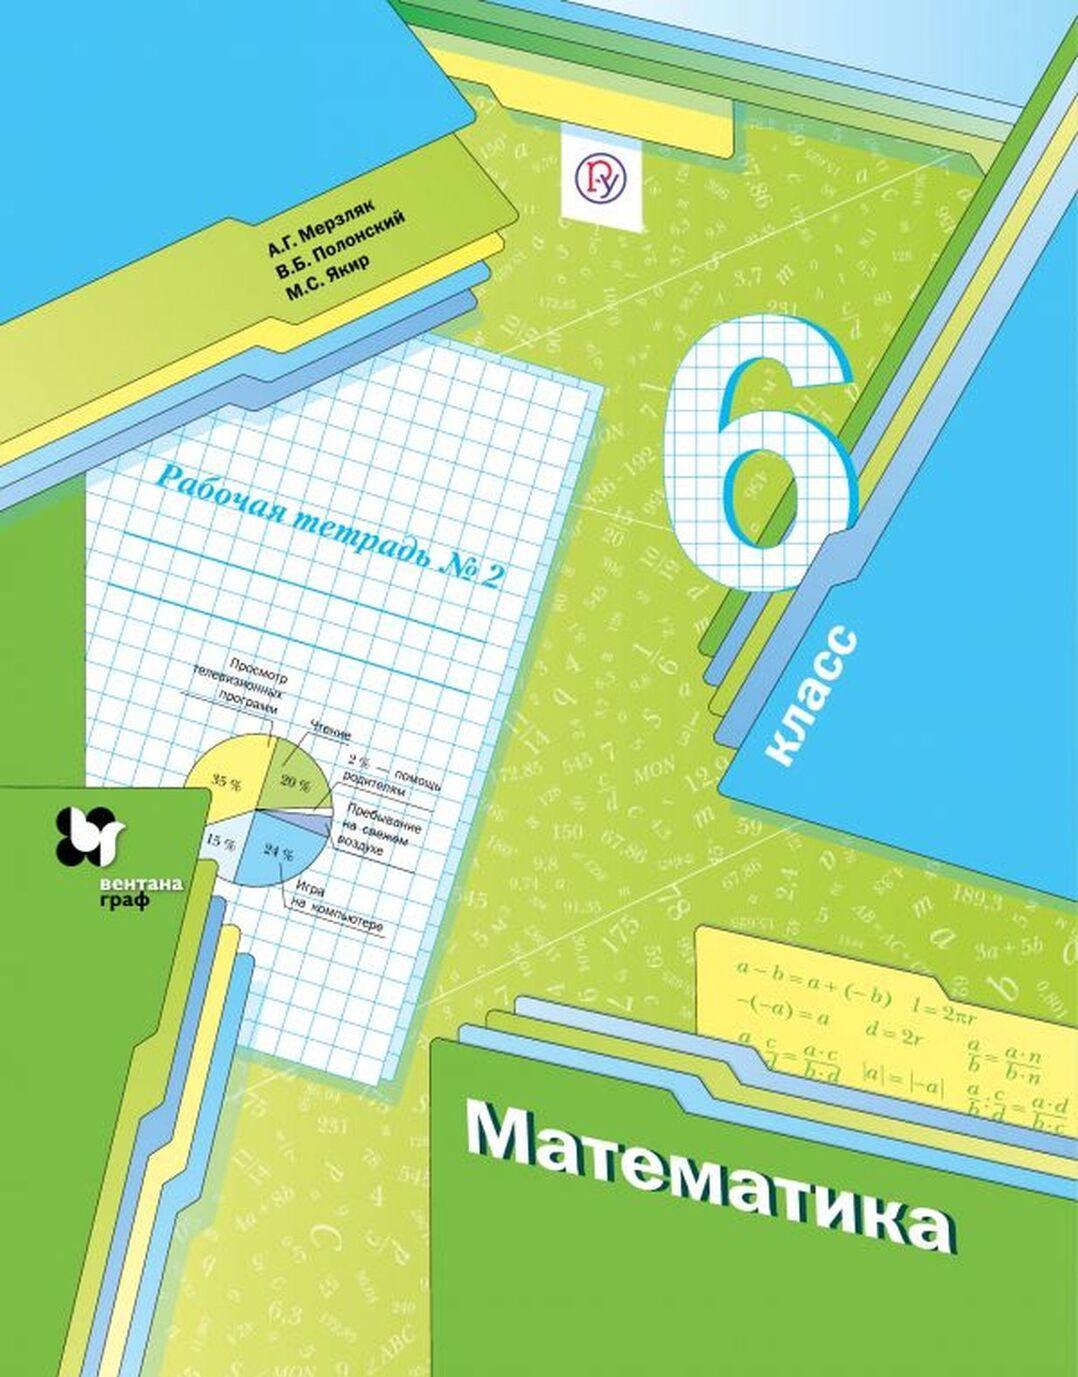 Matematika. 6klass. Rabochaja tetrad. V 3-kh chastjakh. Chast 2 | Merzljak Arkadij Grigorevich, Jakir Mikhail Semenovich